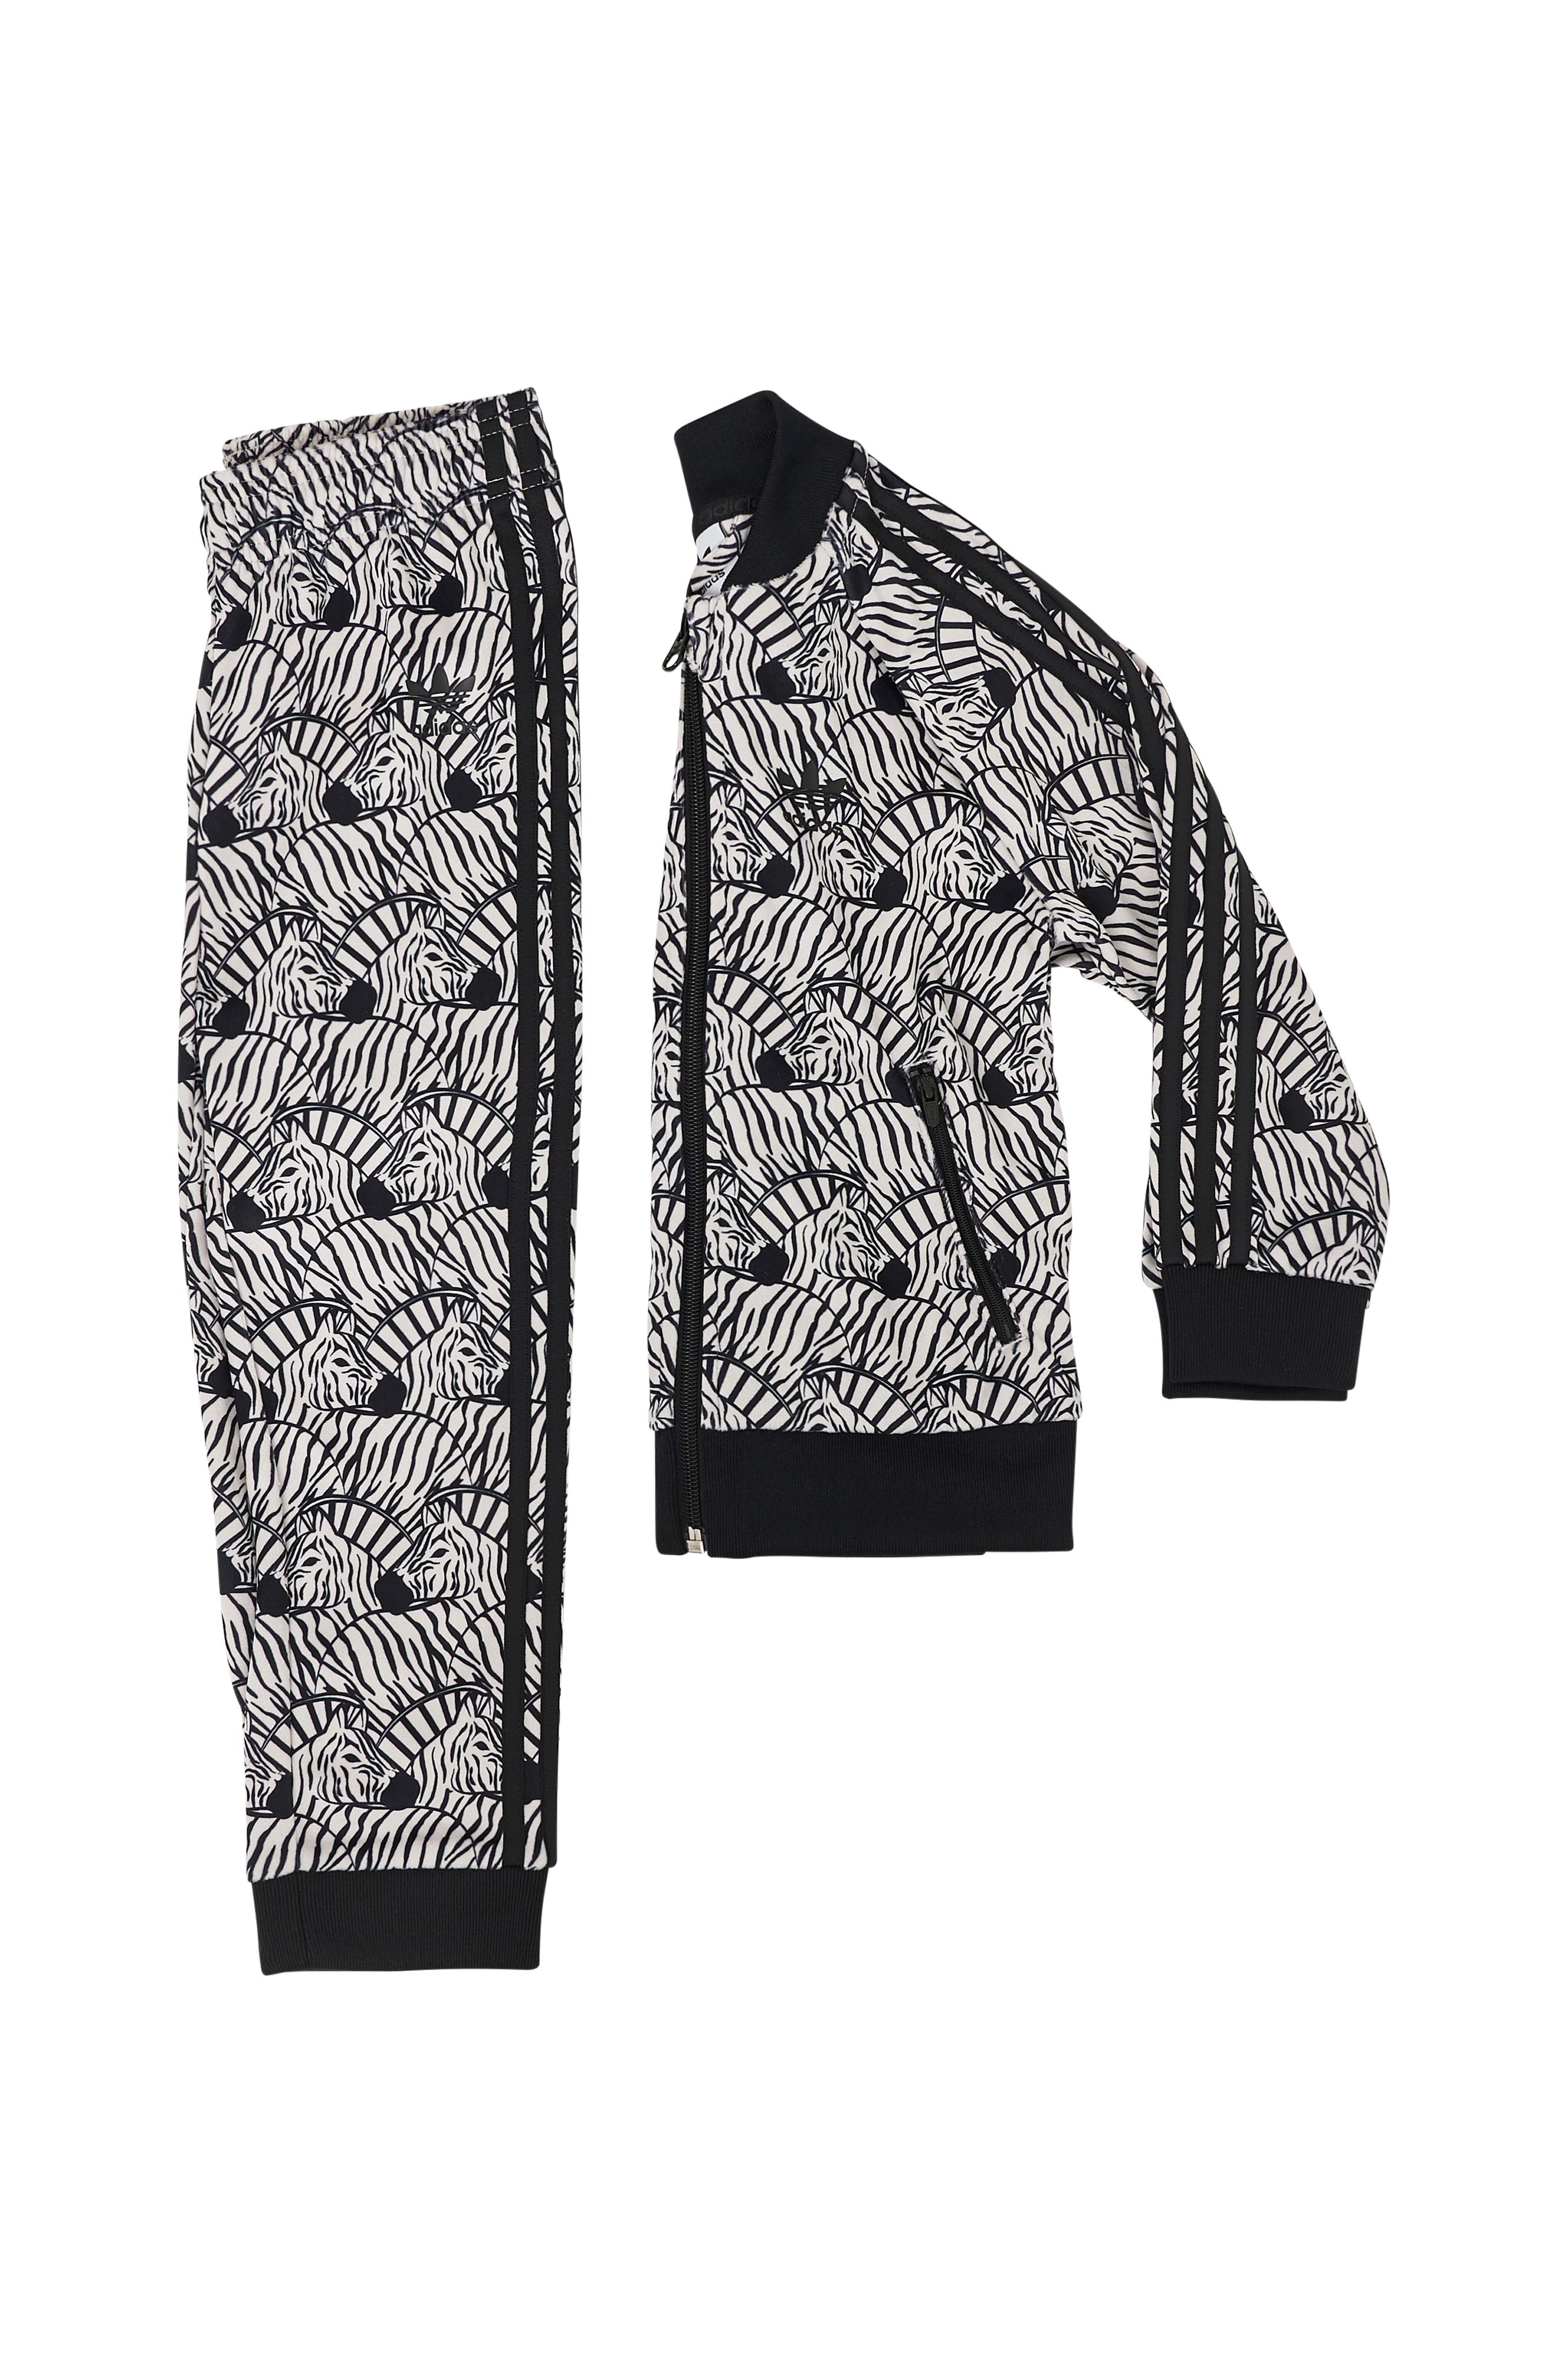 081af7d2a5c adidas Originals Zebra SST Track Suit -treeniasu - Ruskea - Lapset -  Ellos.fi